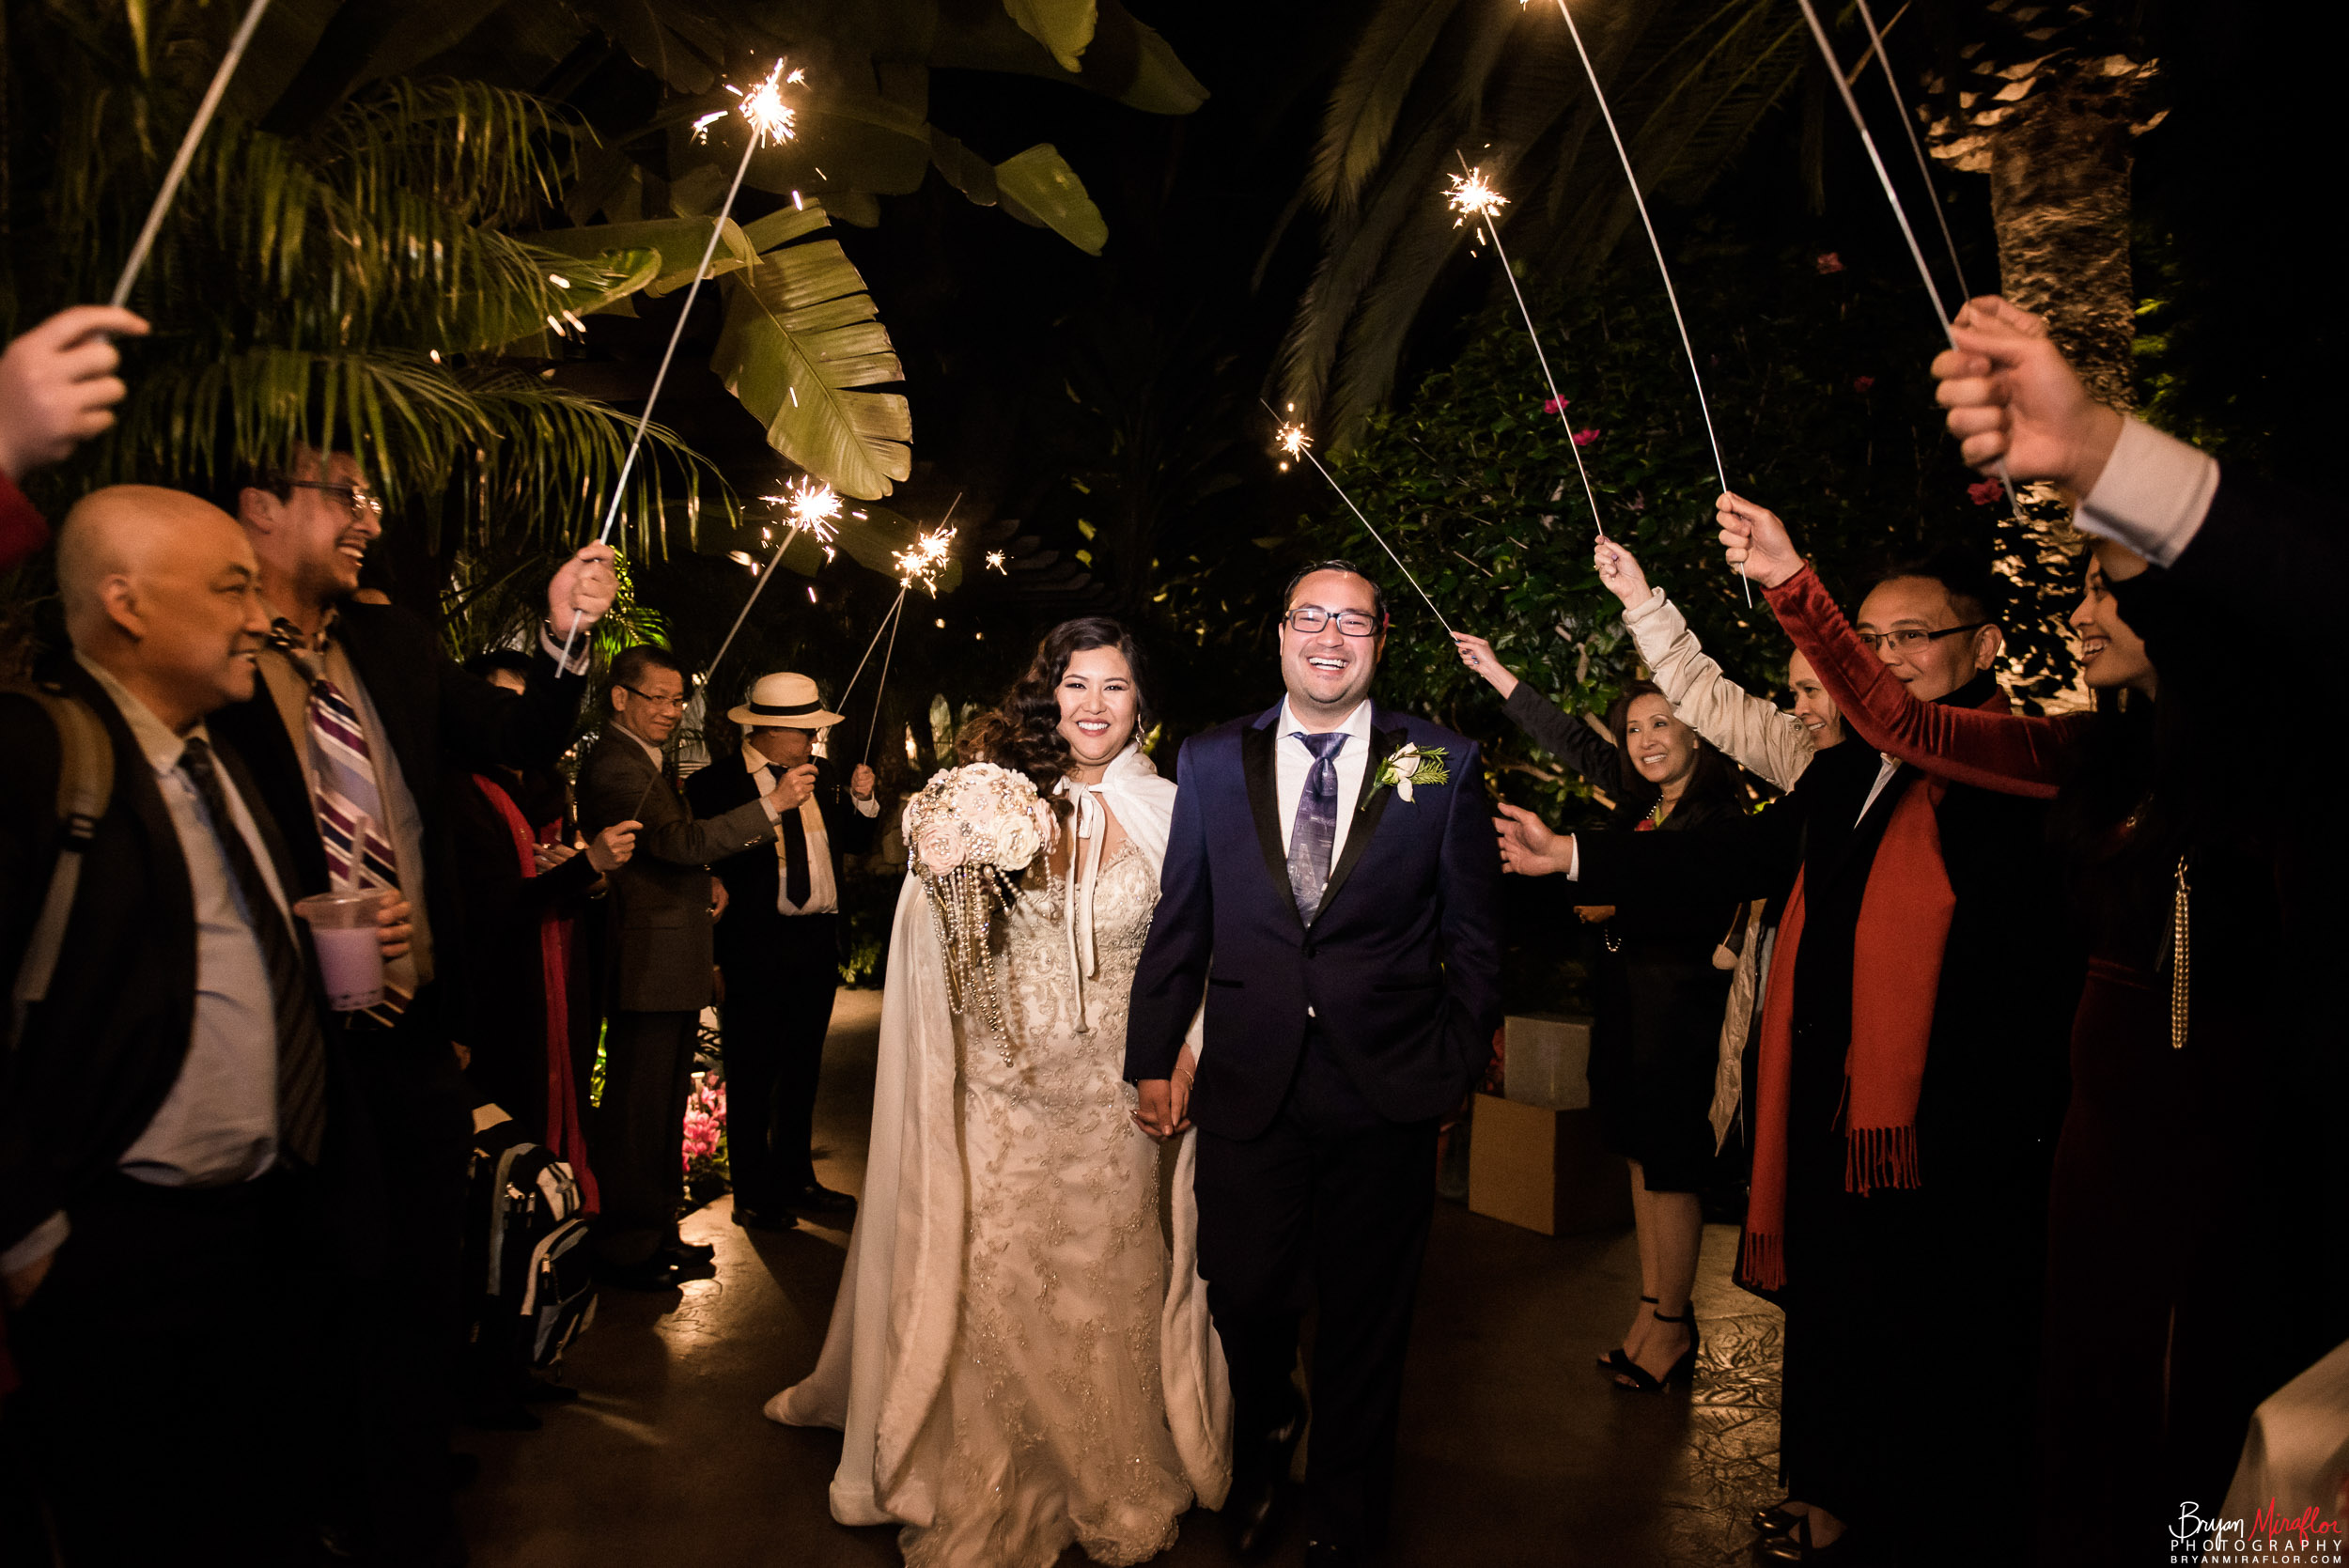 Bryan-Miraflor-Photography-Hannah-Jonathan-Married-Grand-Traditions-Estate-Gardens-Fallbrook-20171222-239.jpg